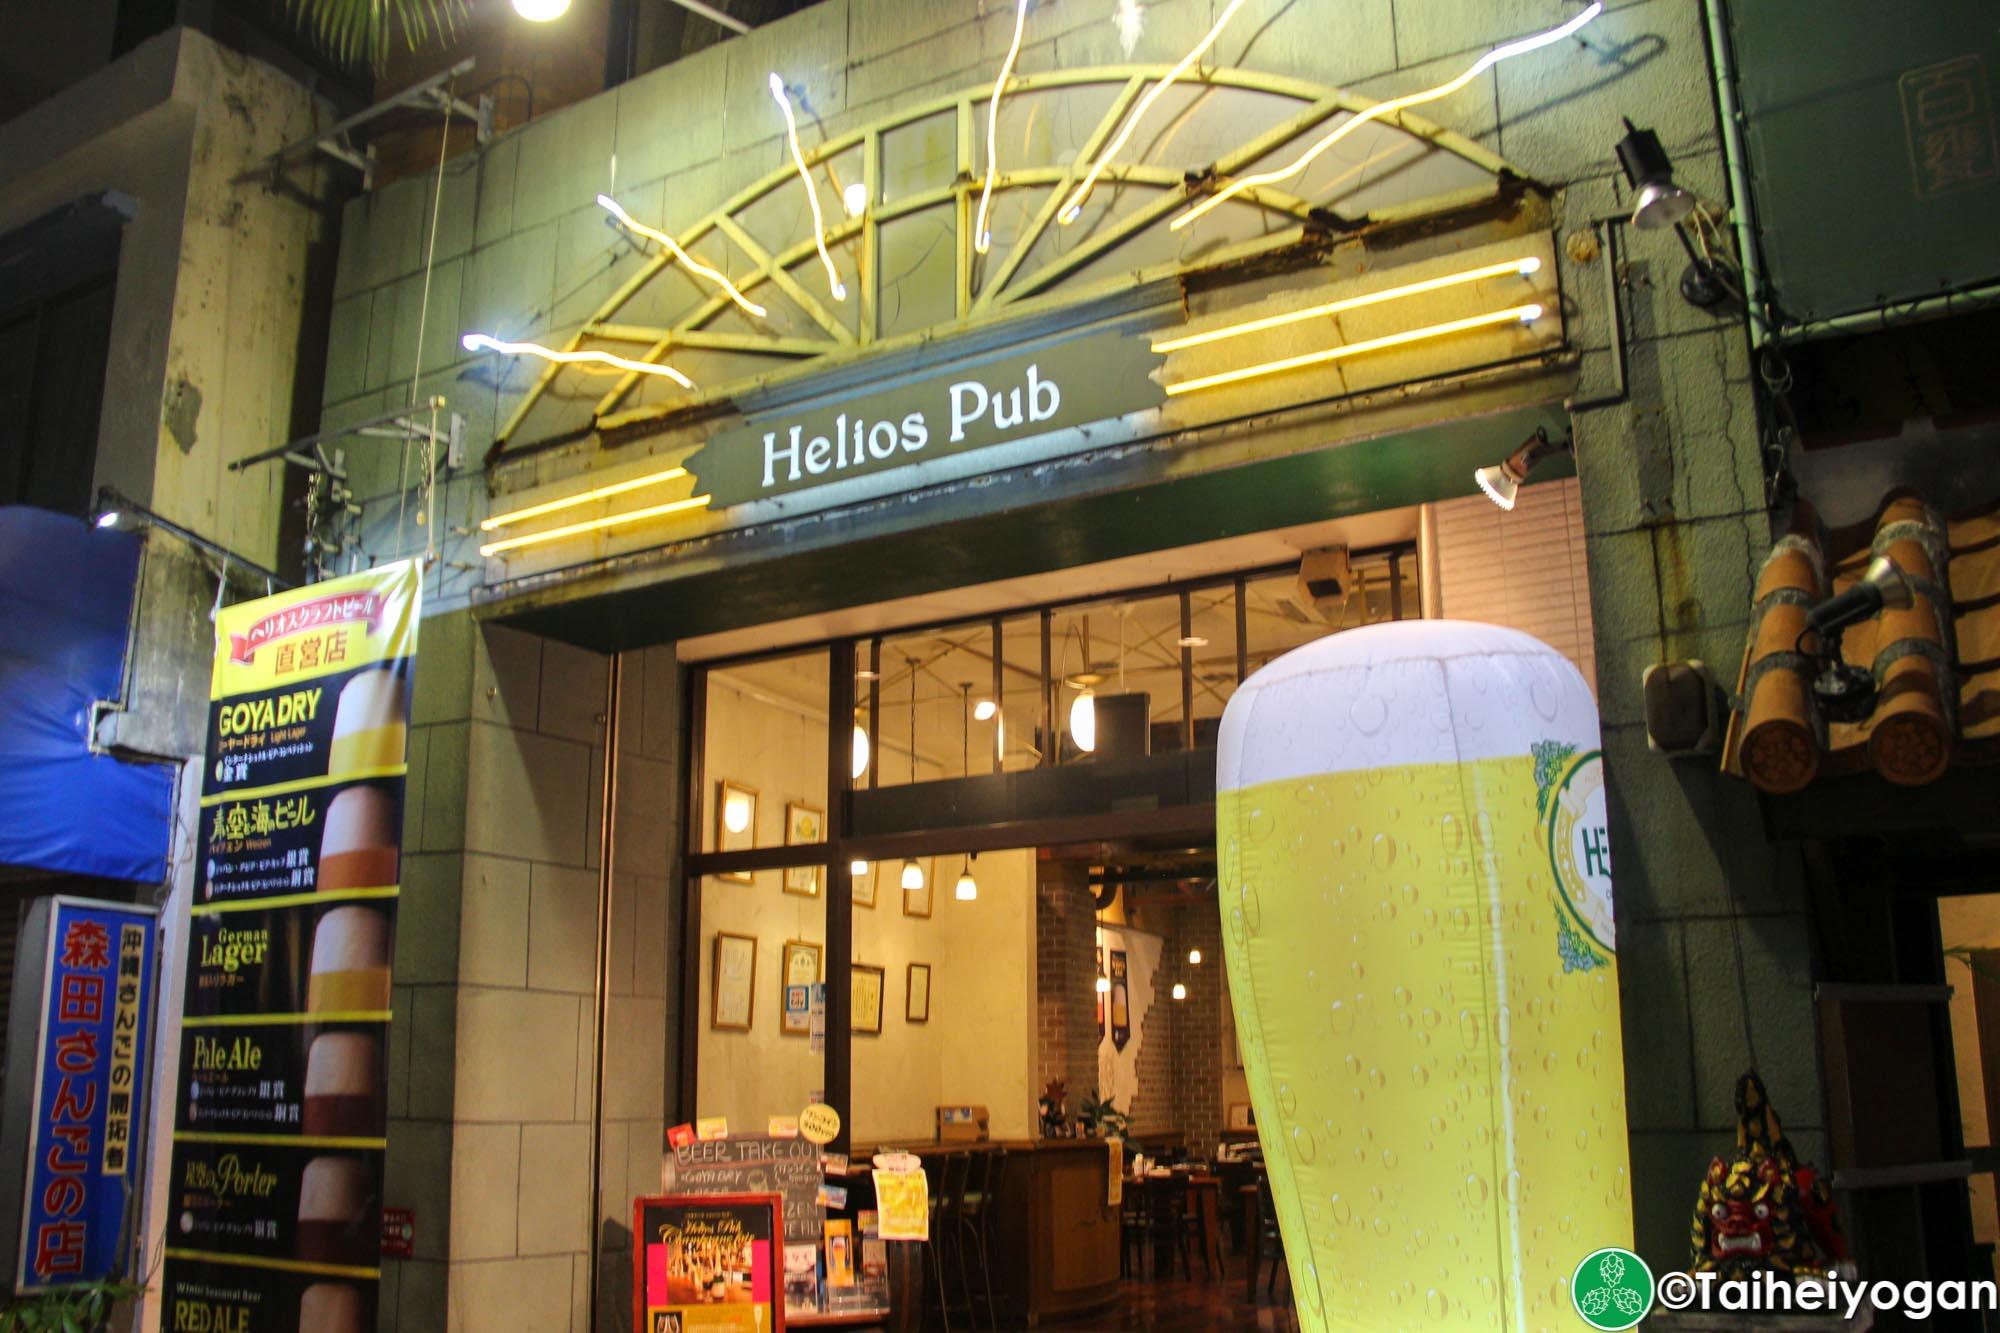 Helios Pub - Entrance